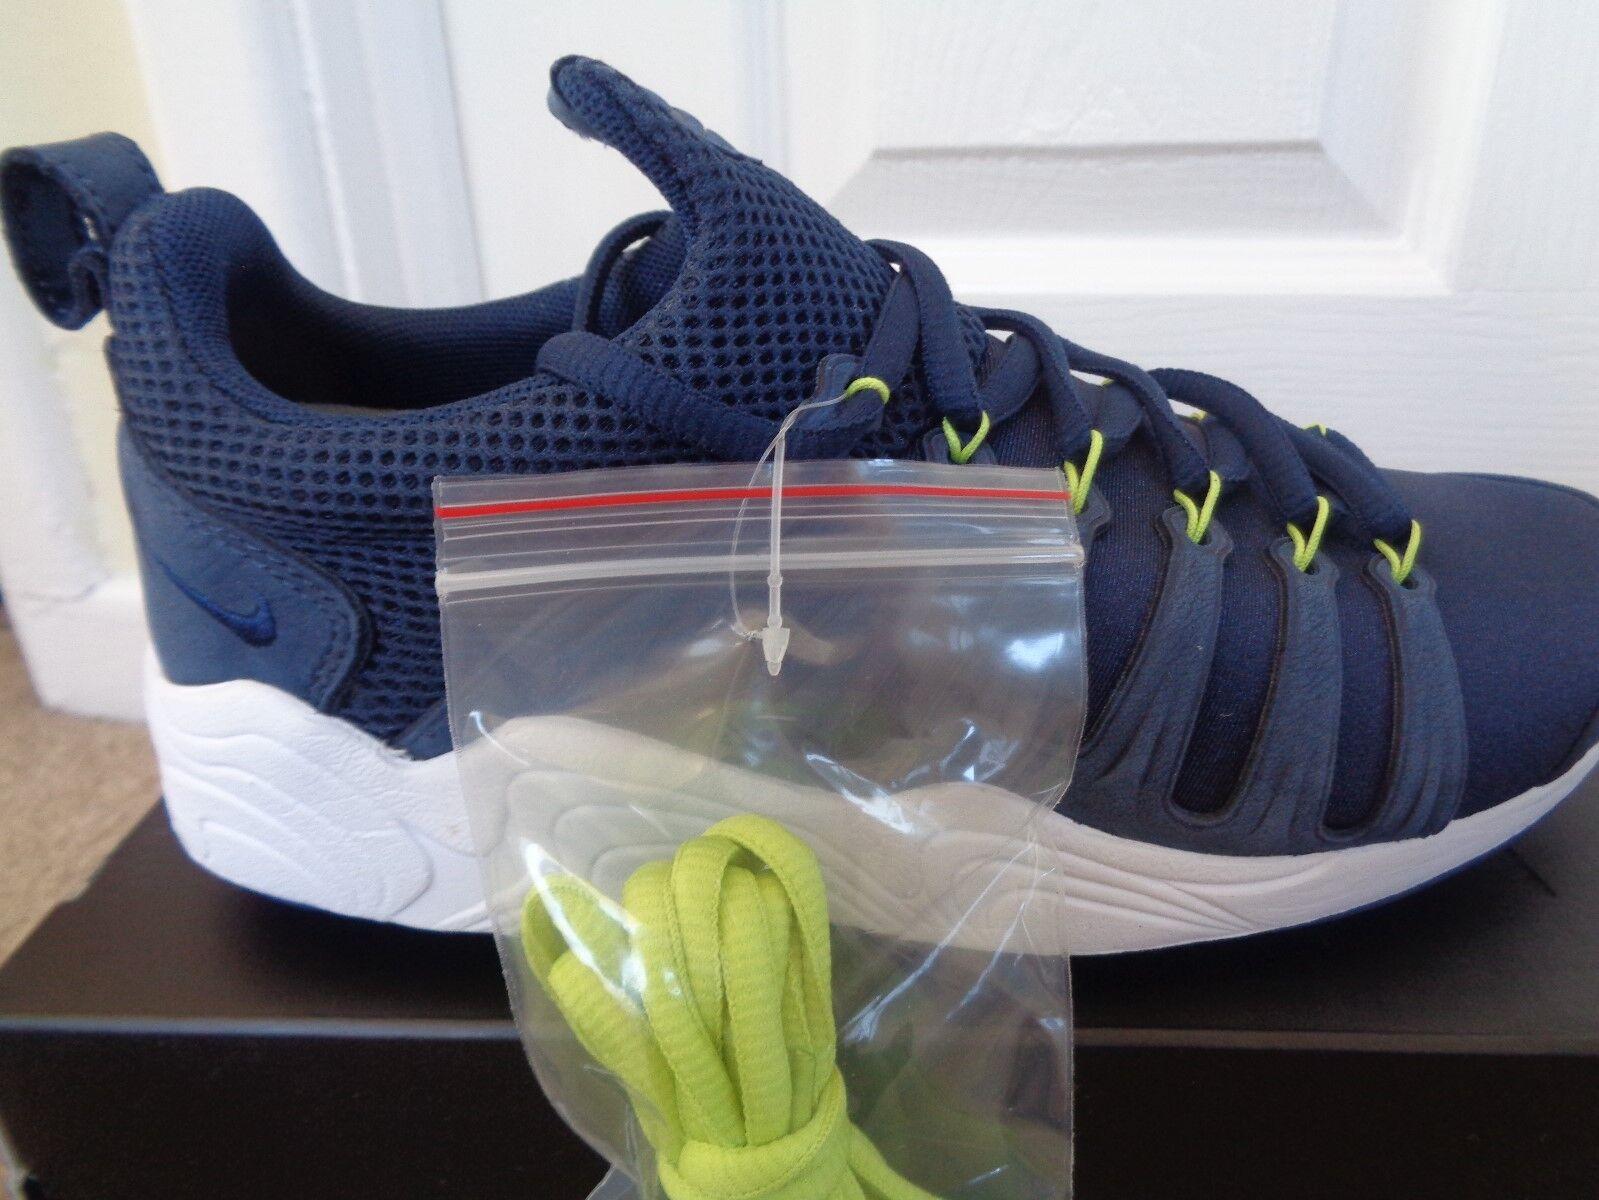 Nike Air Zoom Spirimic trainers sneakers 881983 400 eu 36.5 us 4.5 NEW+BOX